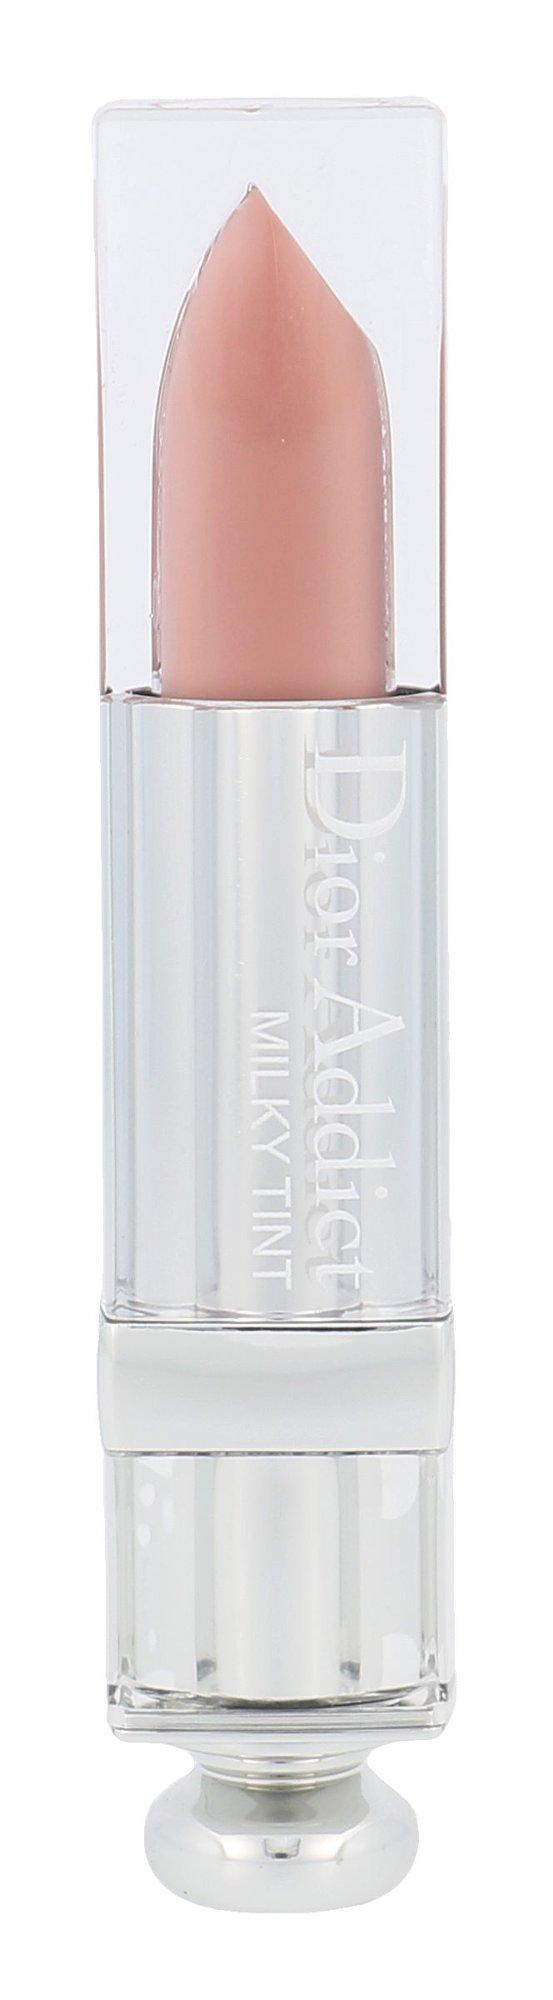 Christian Dior Addict Cosmetic 5,5ml 126 Milky Pure Milky Tint